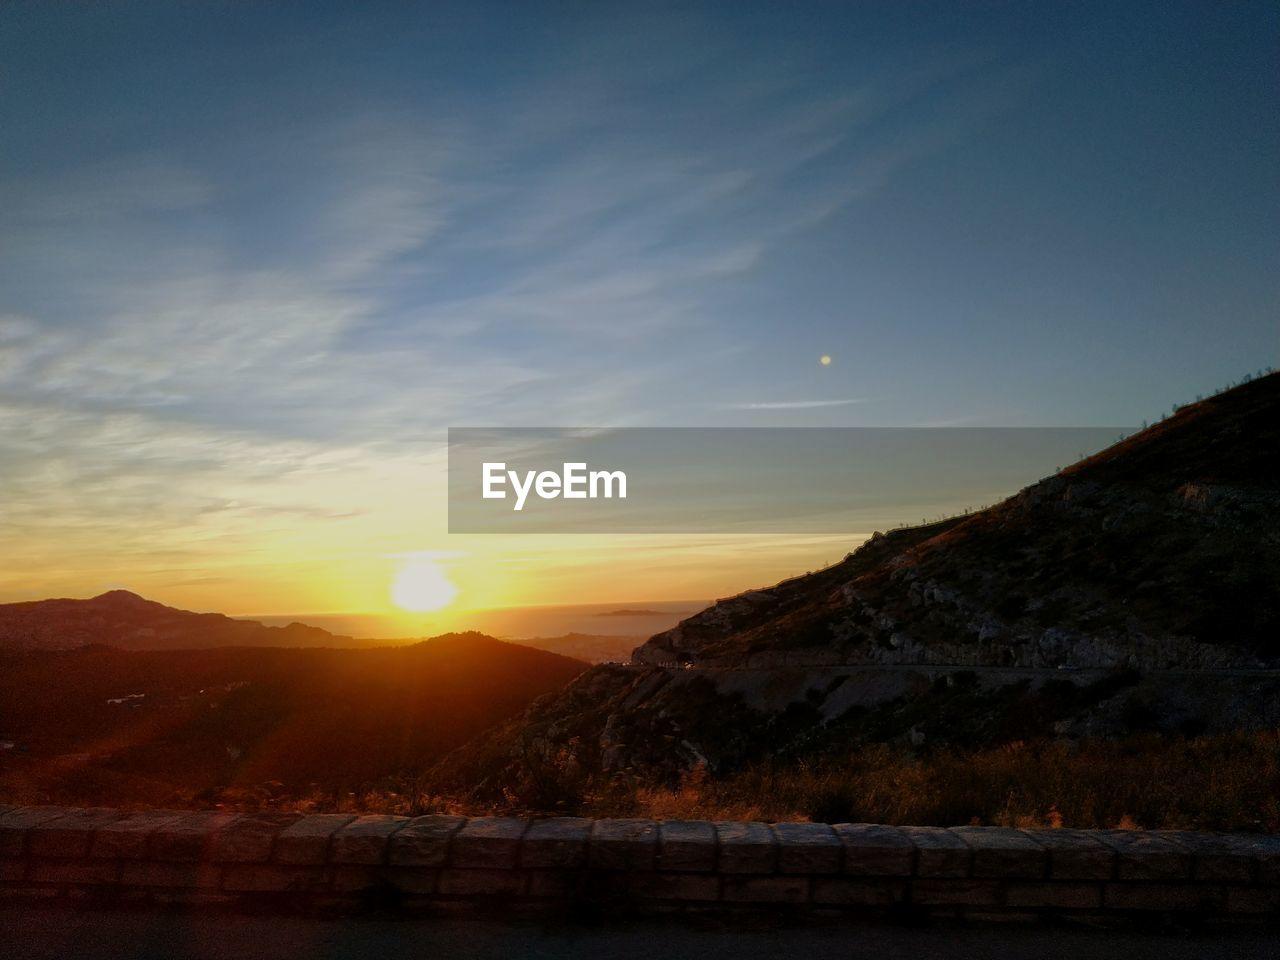 sky, sunset, mountain, beauty in nature, scenics - nature, tranquility, tranquil scene, sun, nature, water, no people, sunlight, orange color, mountain range, environment, cloud - sky, idyllic, outdoors, lake, lens flare, bright